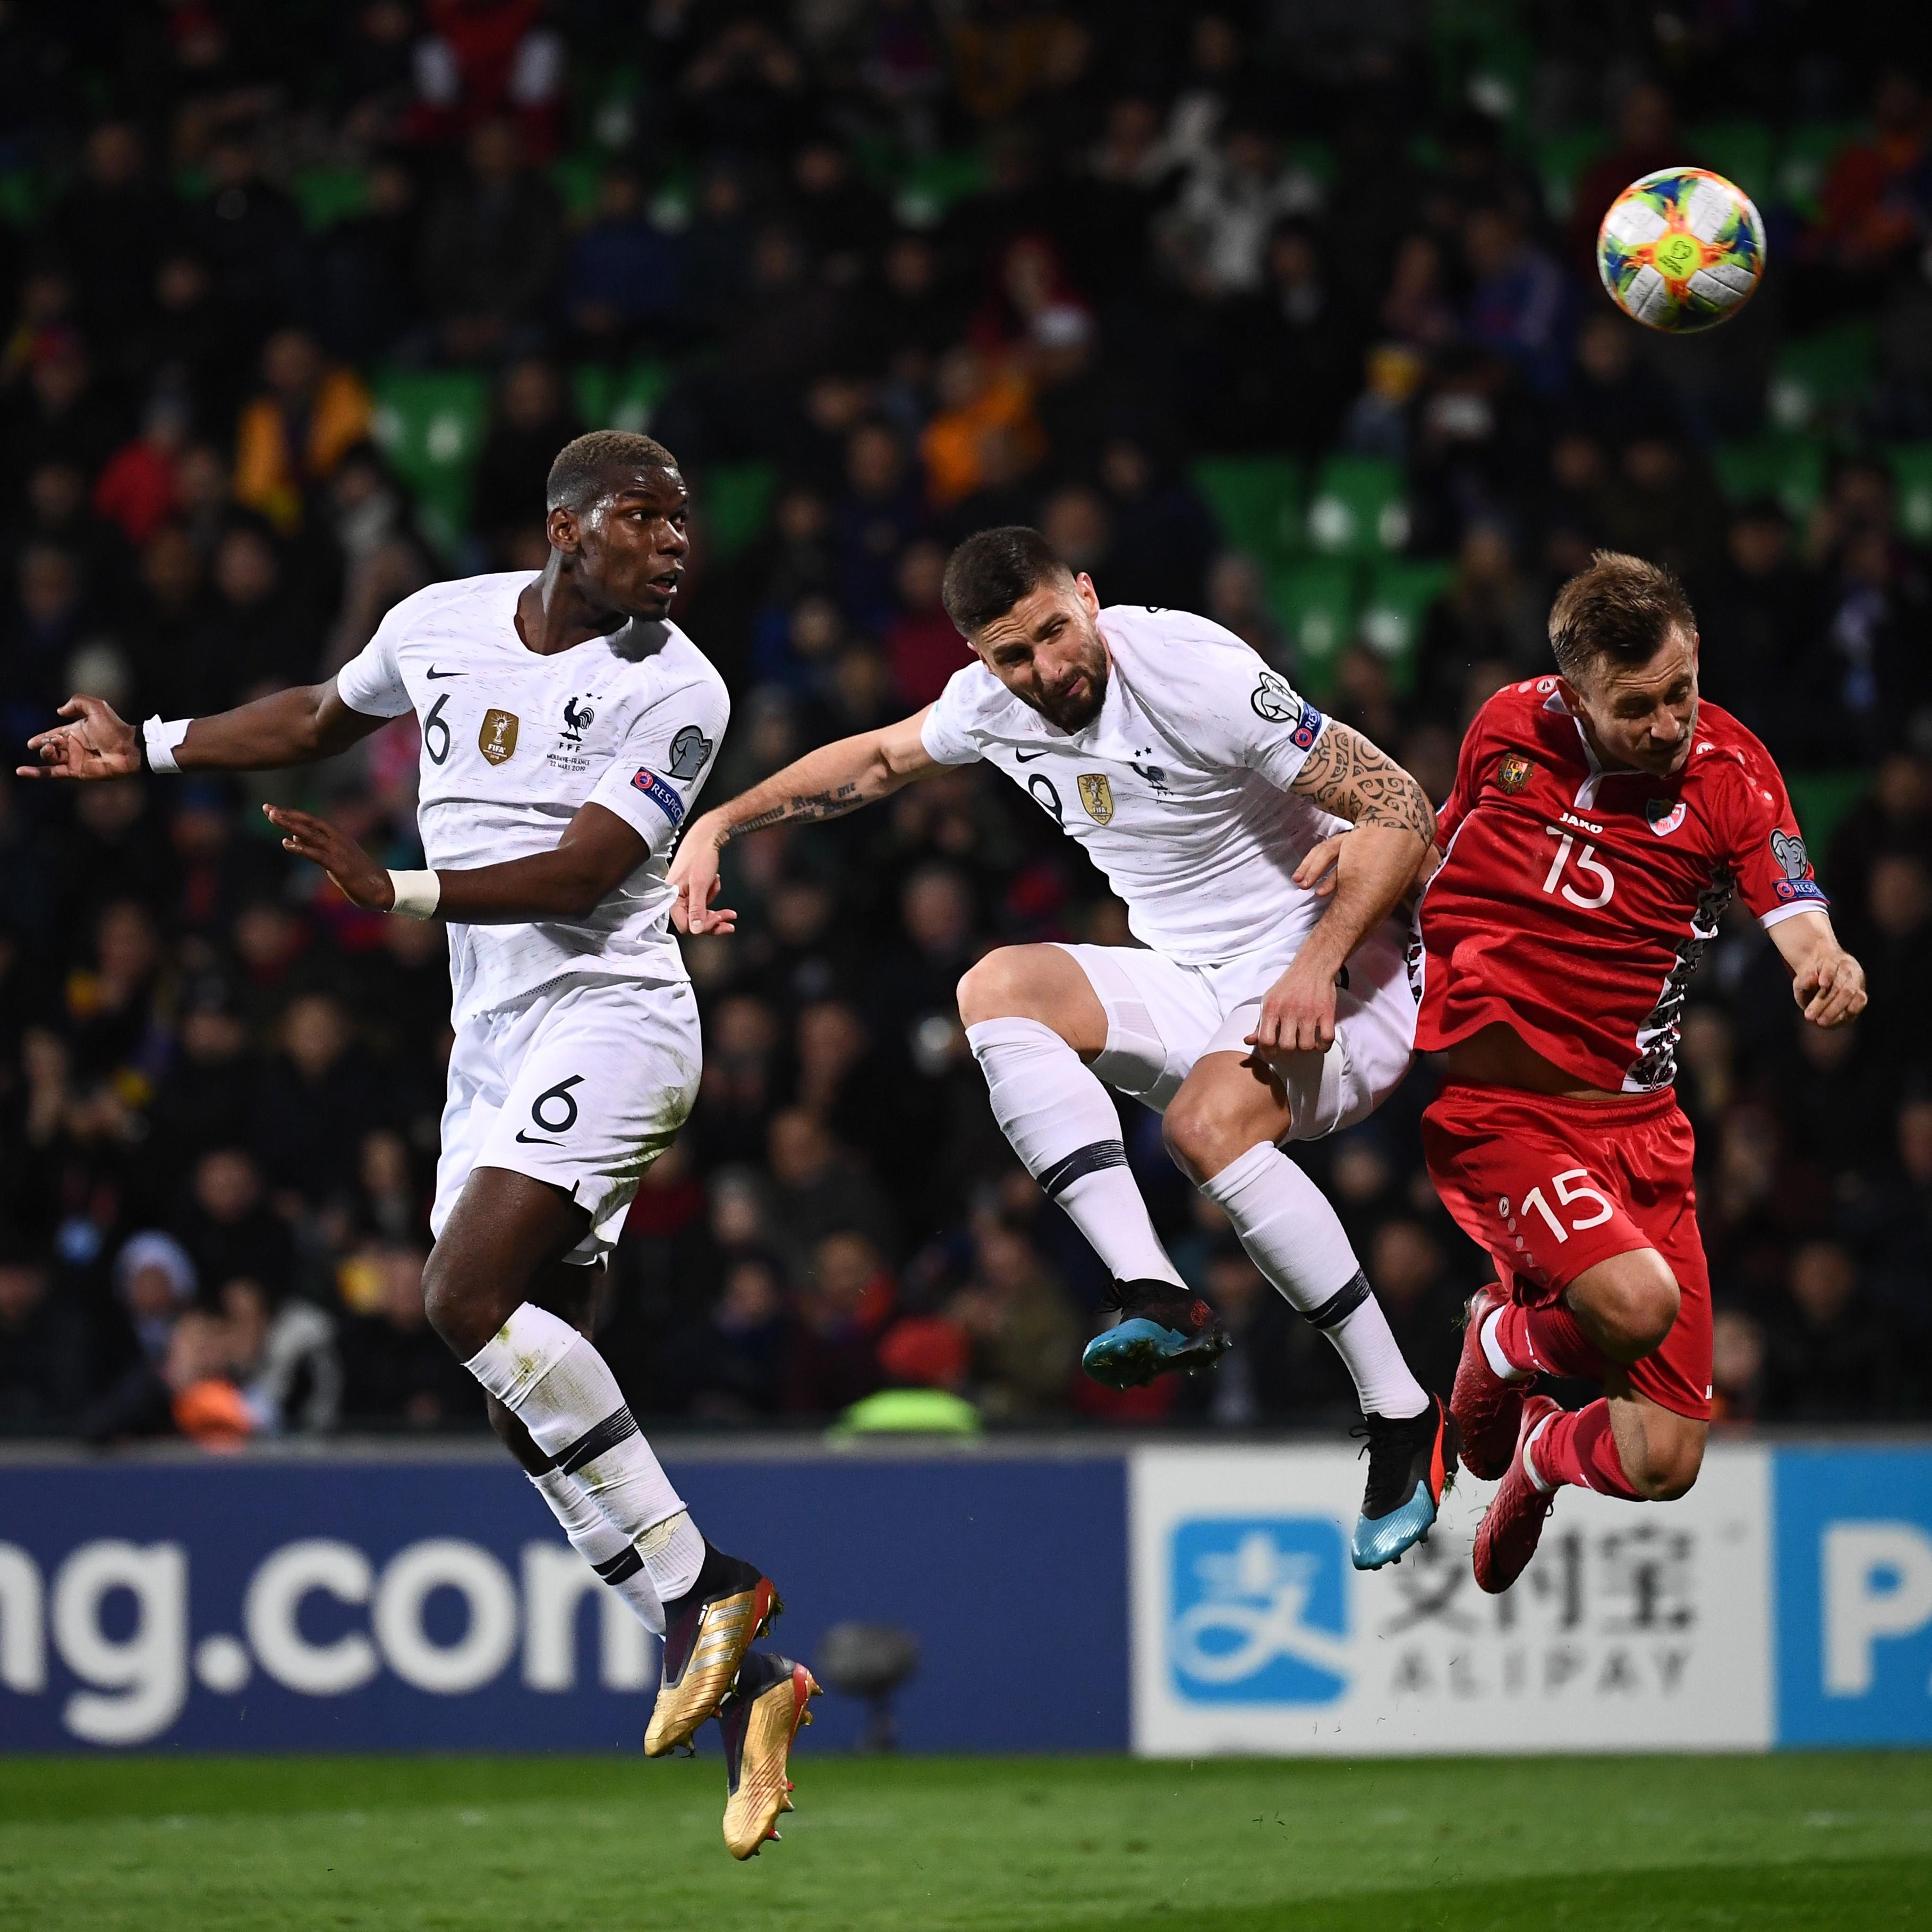 Paul Pogba et Olivier Giroud lors de Moldavie-France / Qualifications Euro 2020